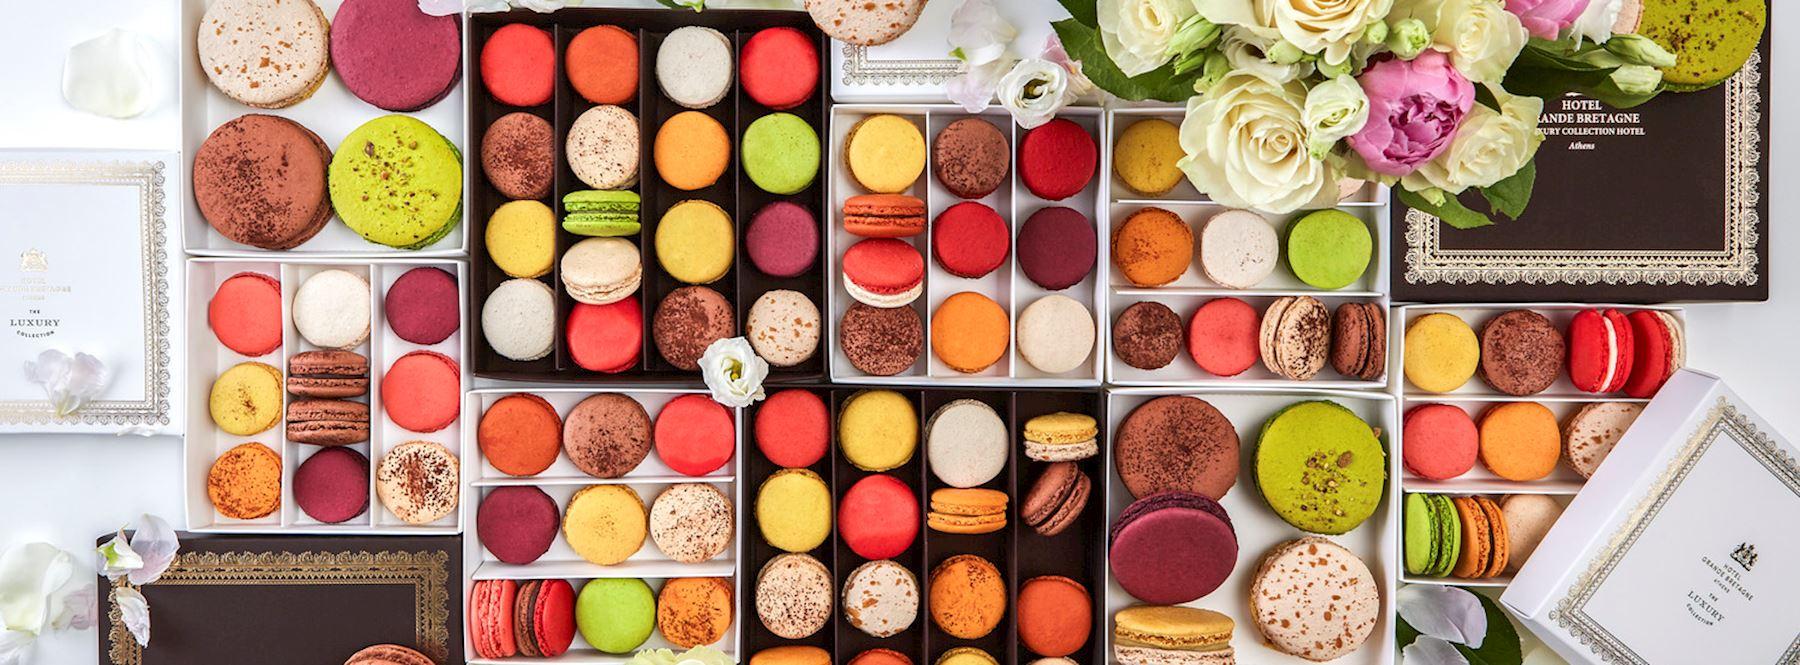 Macaron Flavors by Arnaud